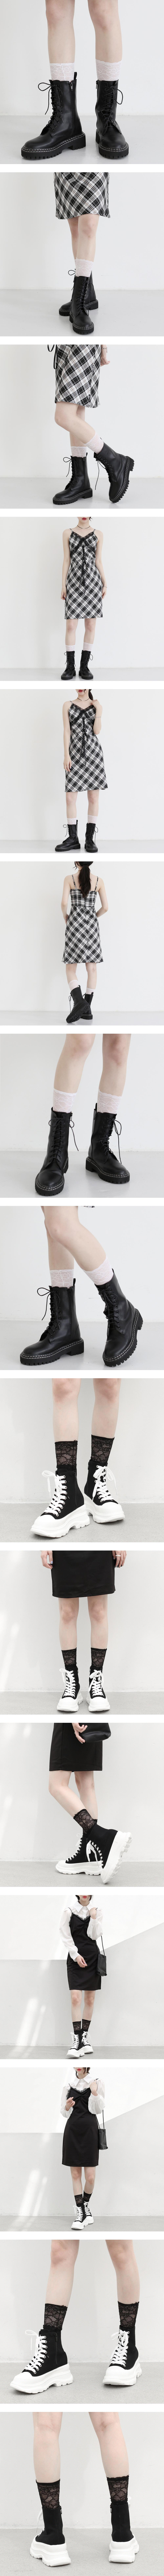 Kenny lace Socks